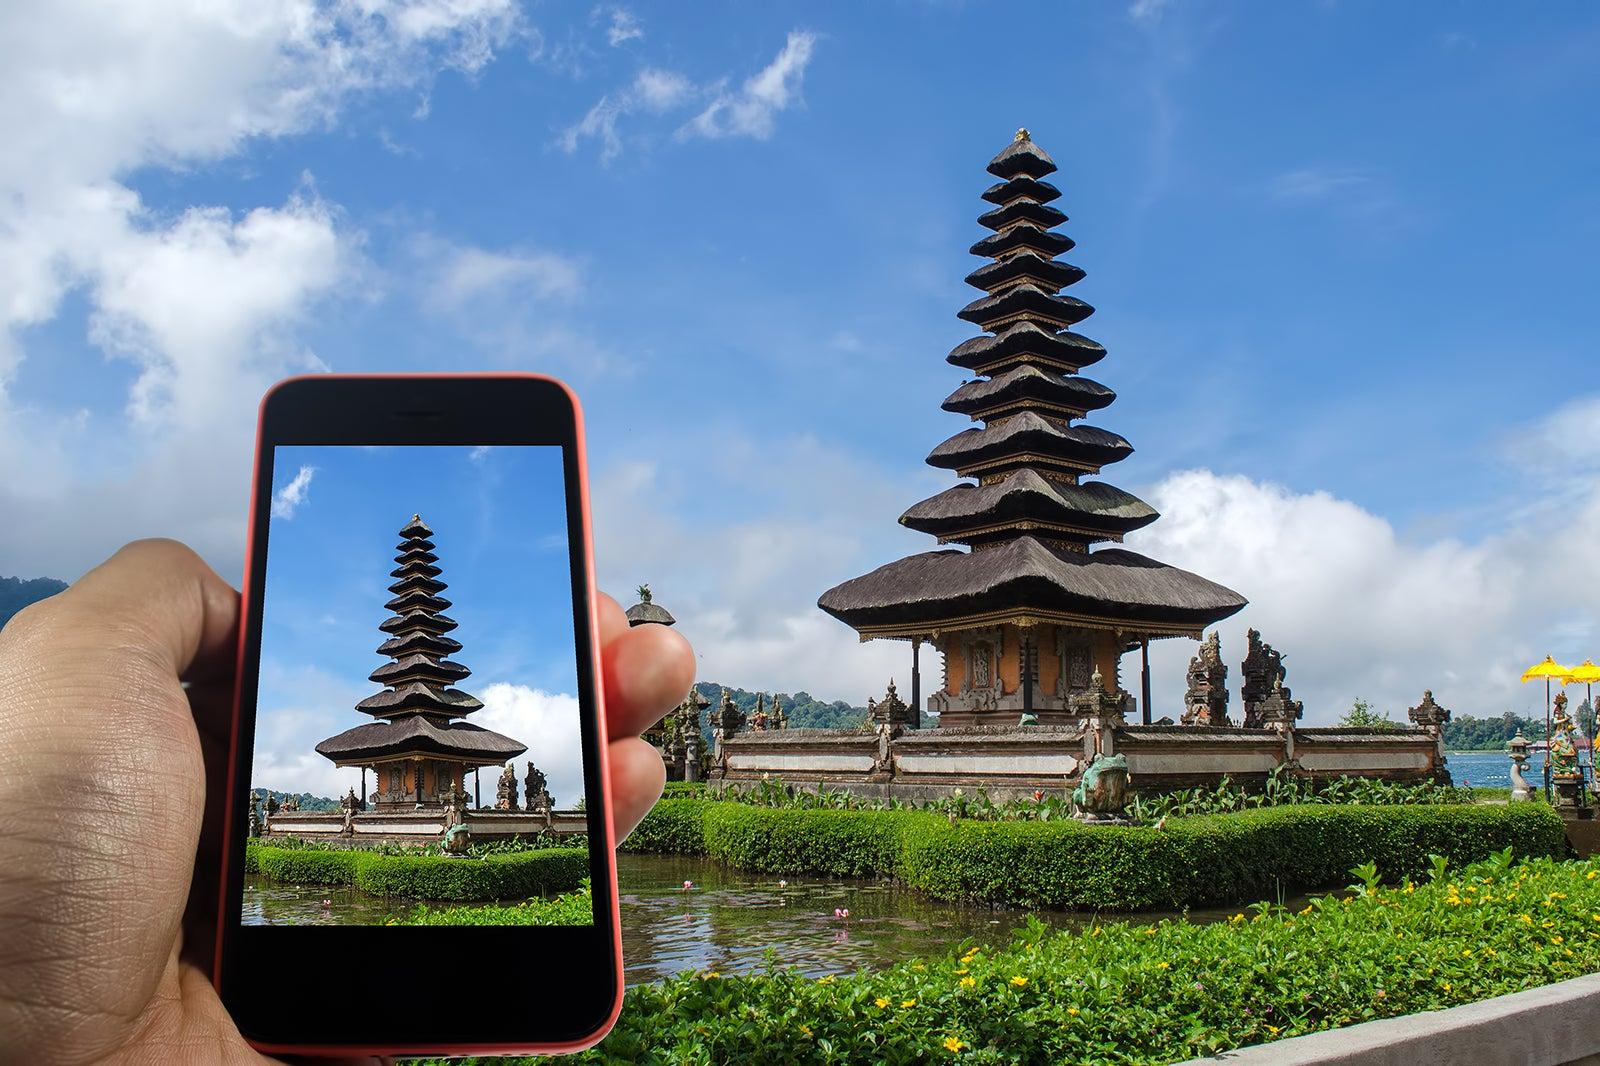 Indonesien dating apps